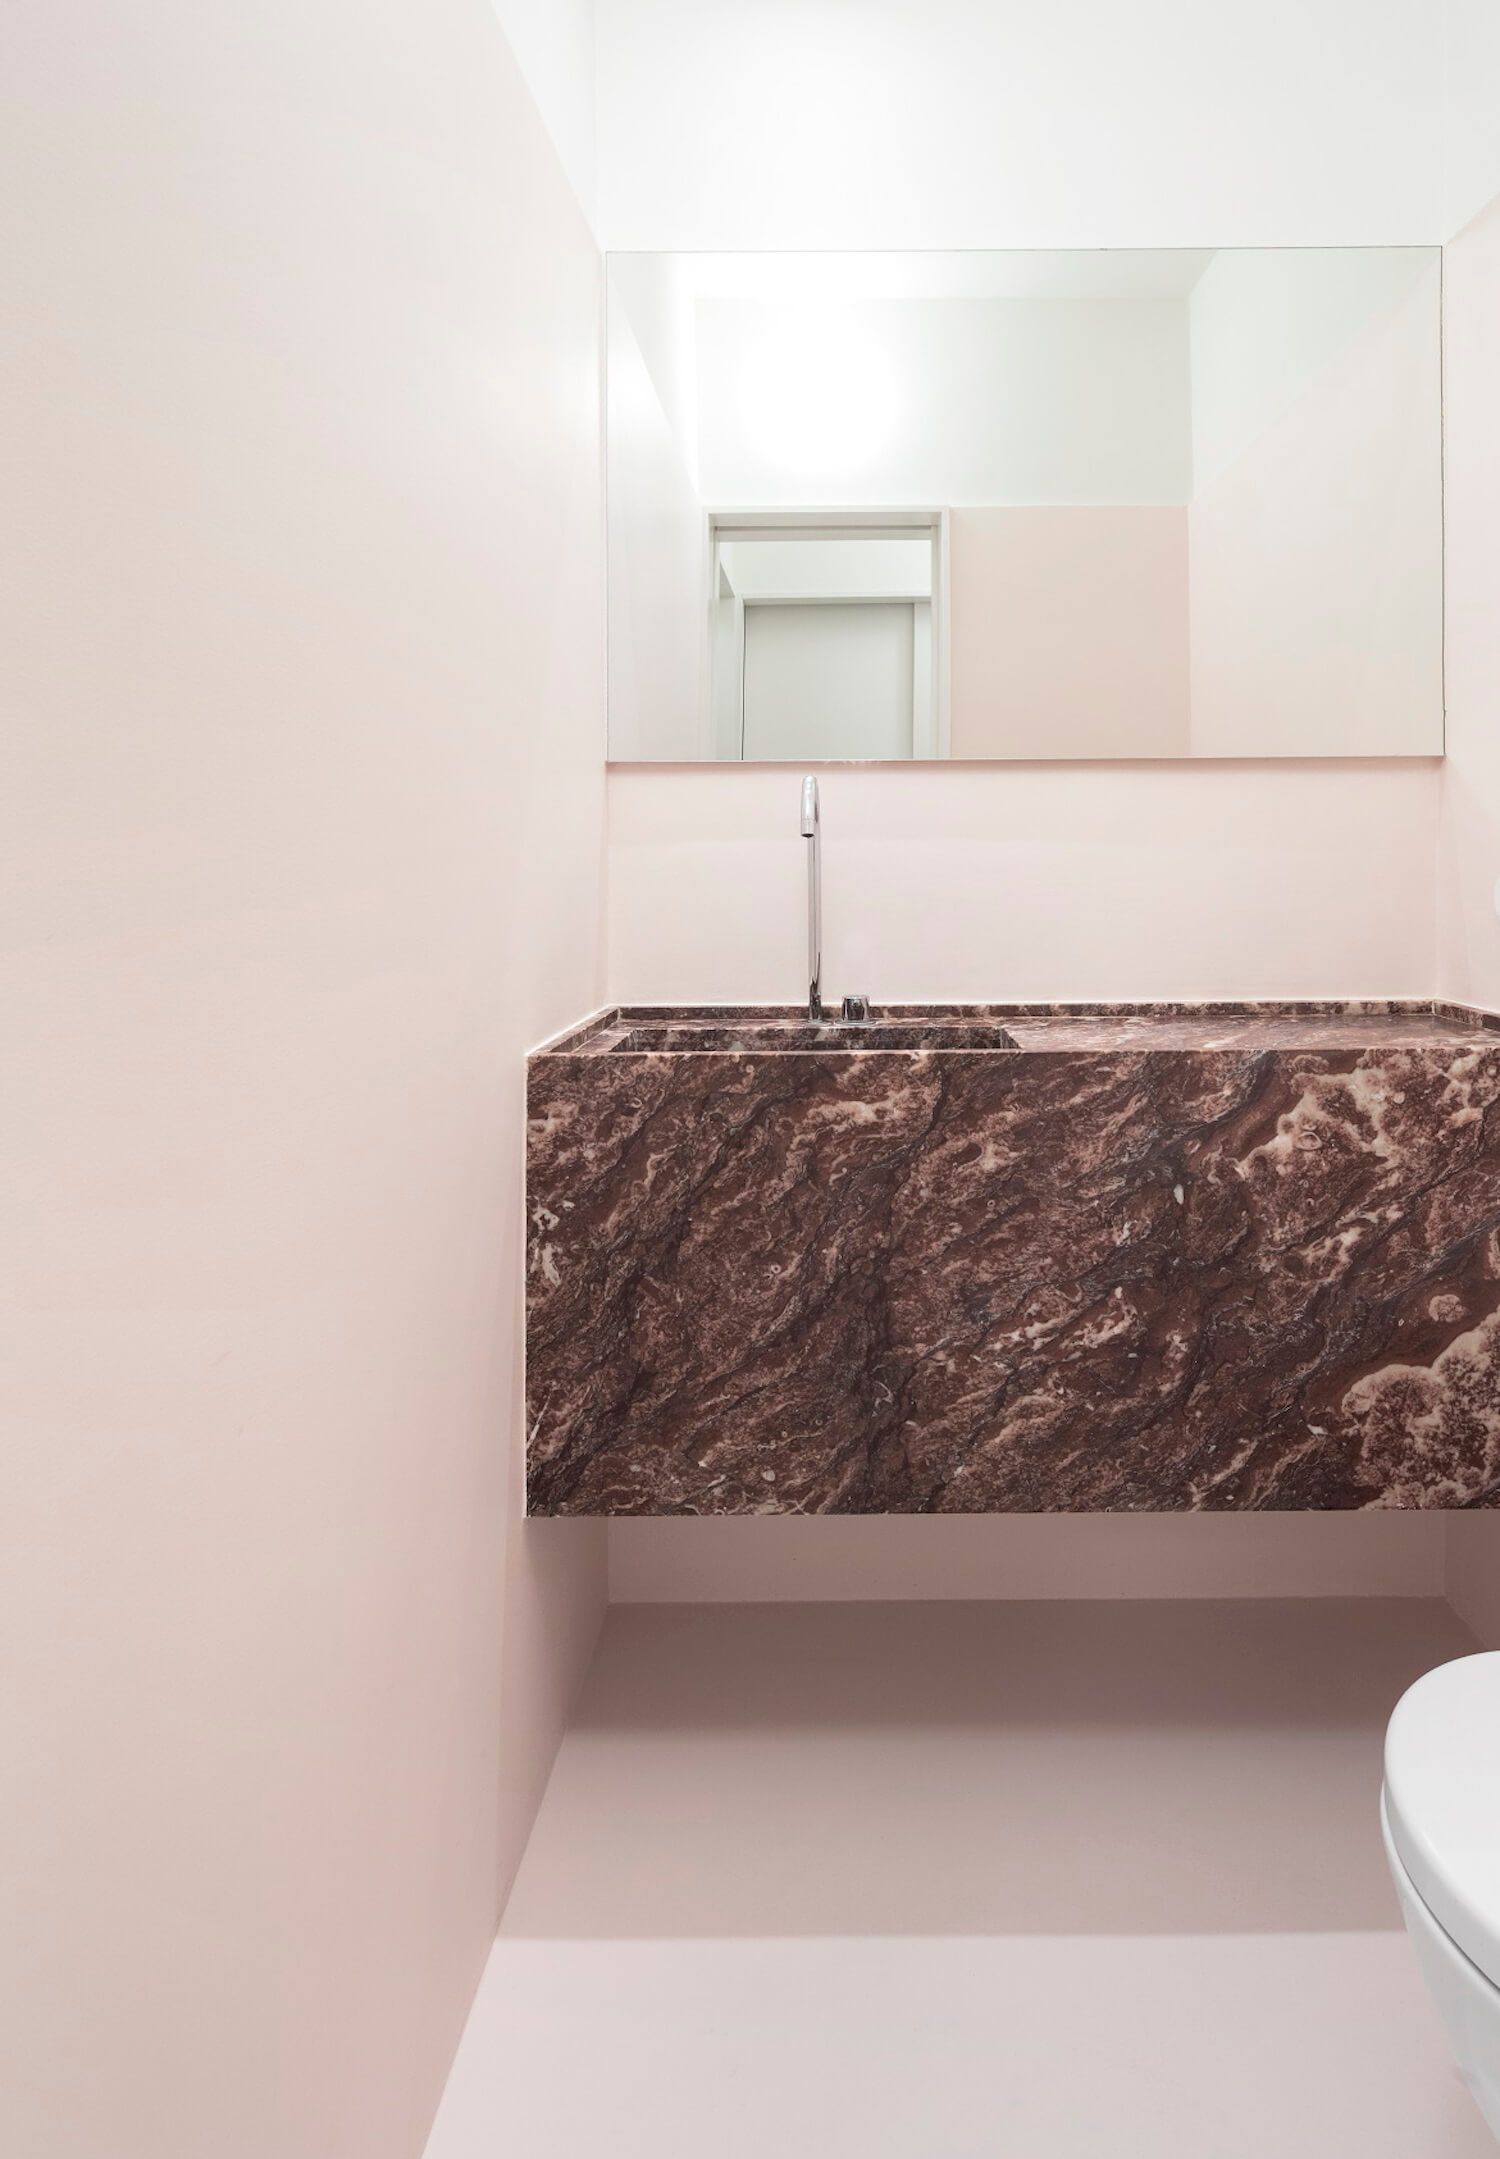 Apartment Amc By Rar Studio Modern Interior Design Bathroom Interior Design Interior Design Living Room